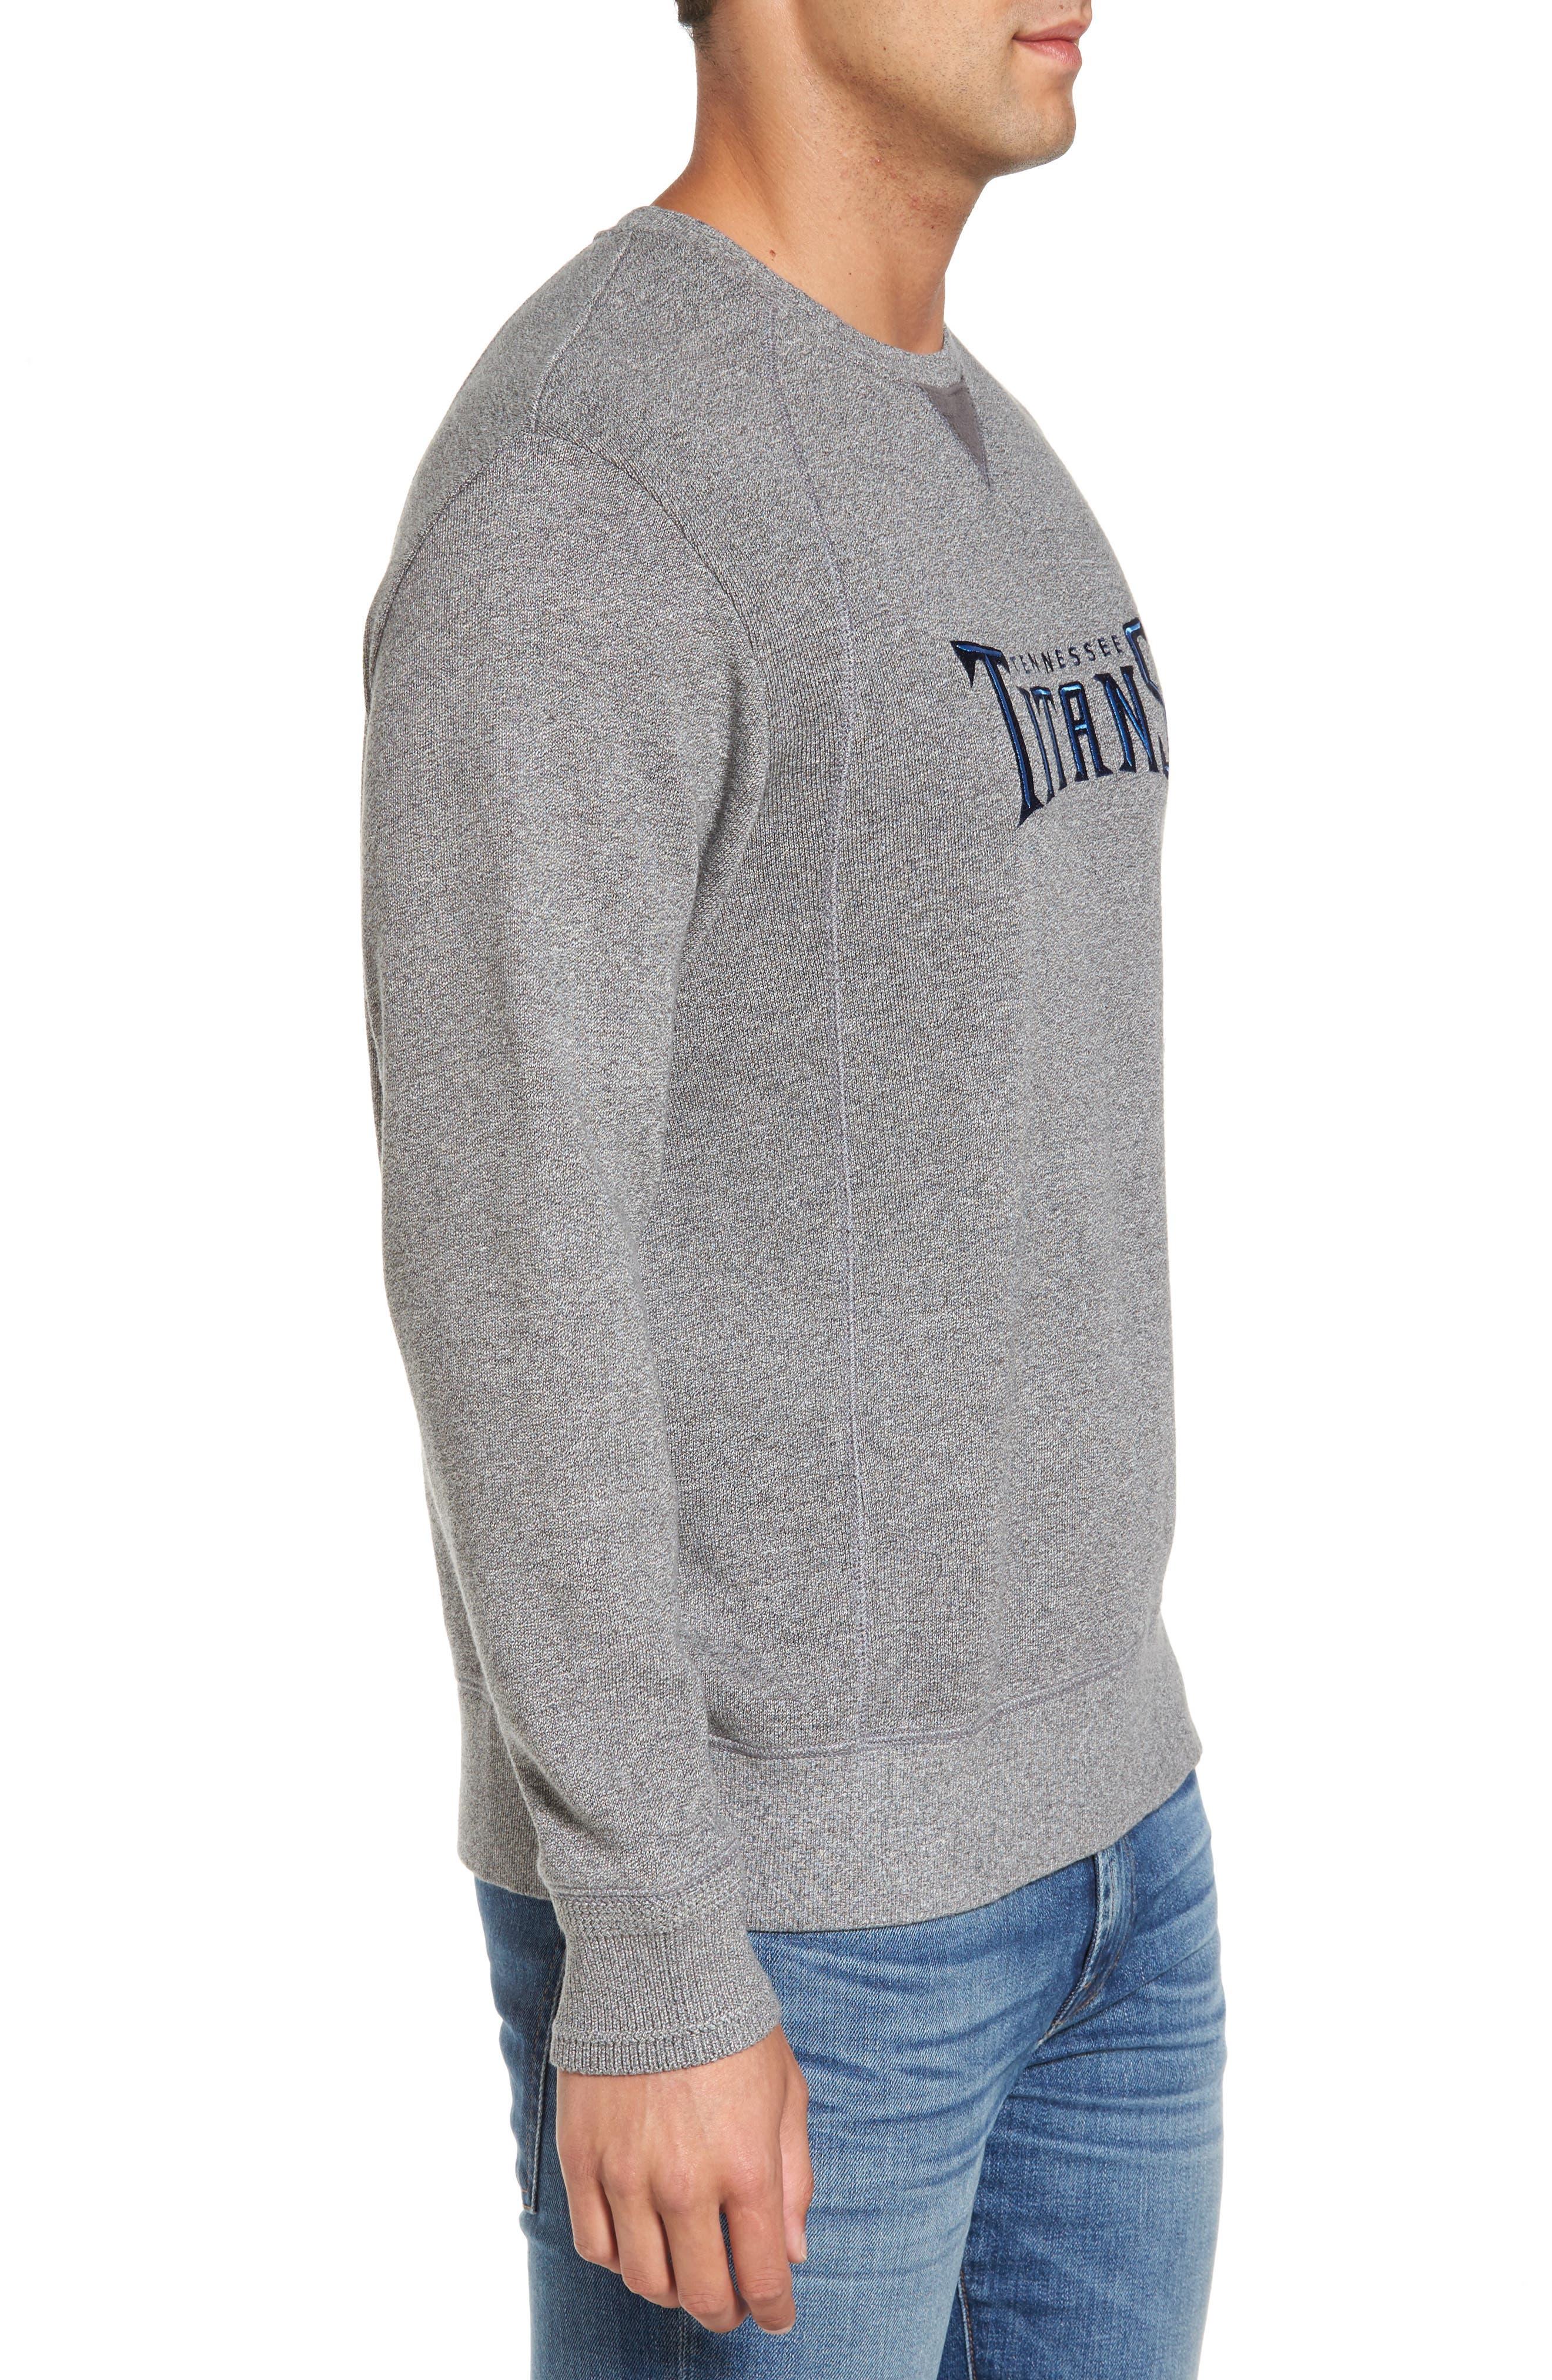 NFL Stitch of Liberty Embroidered Crewneck Sweatshirt,                             Alternate thumbnail 91, color,